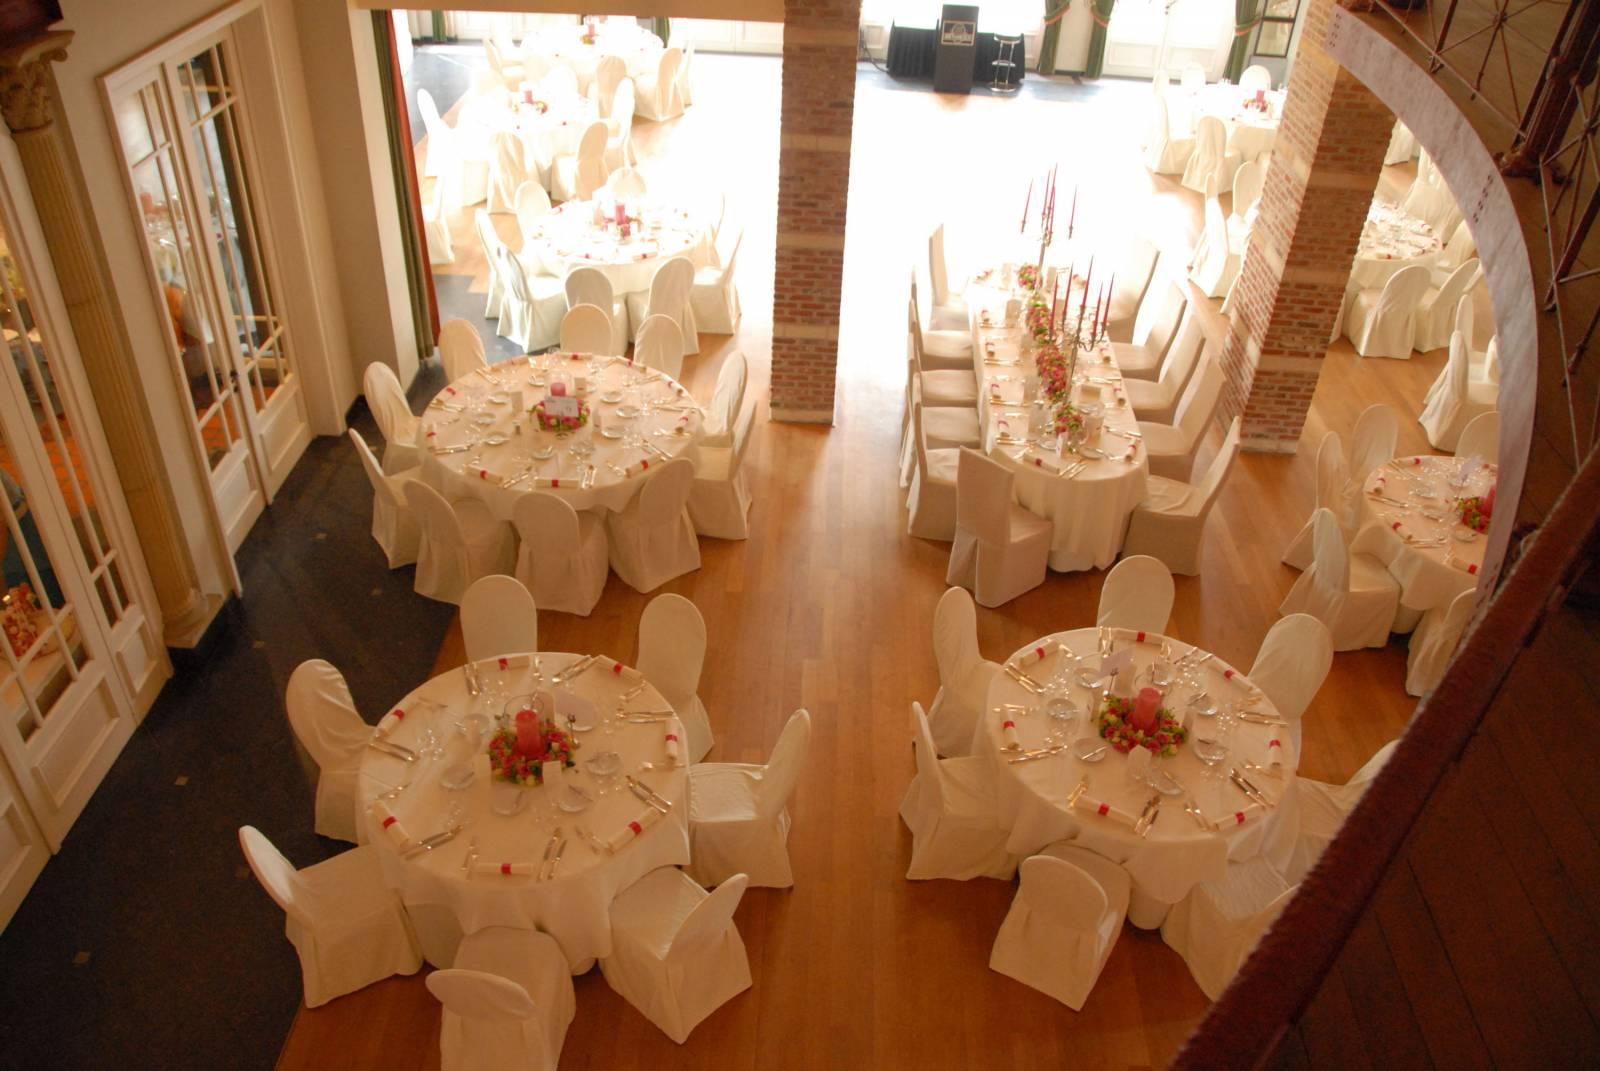 Zaal Orangerie - House of Weddings